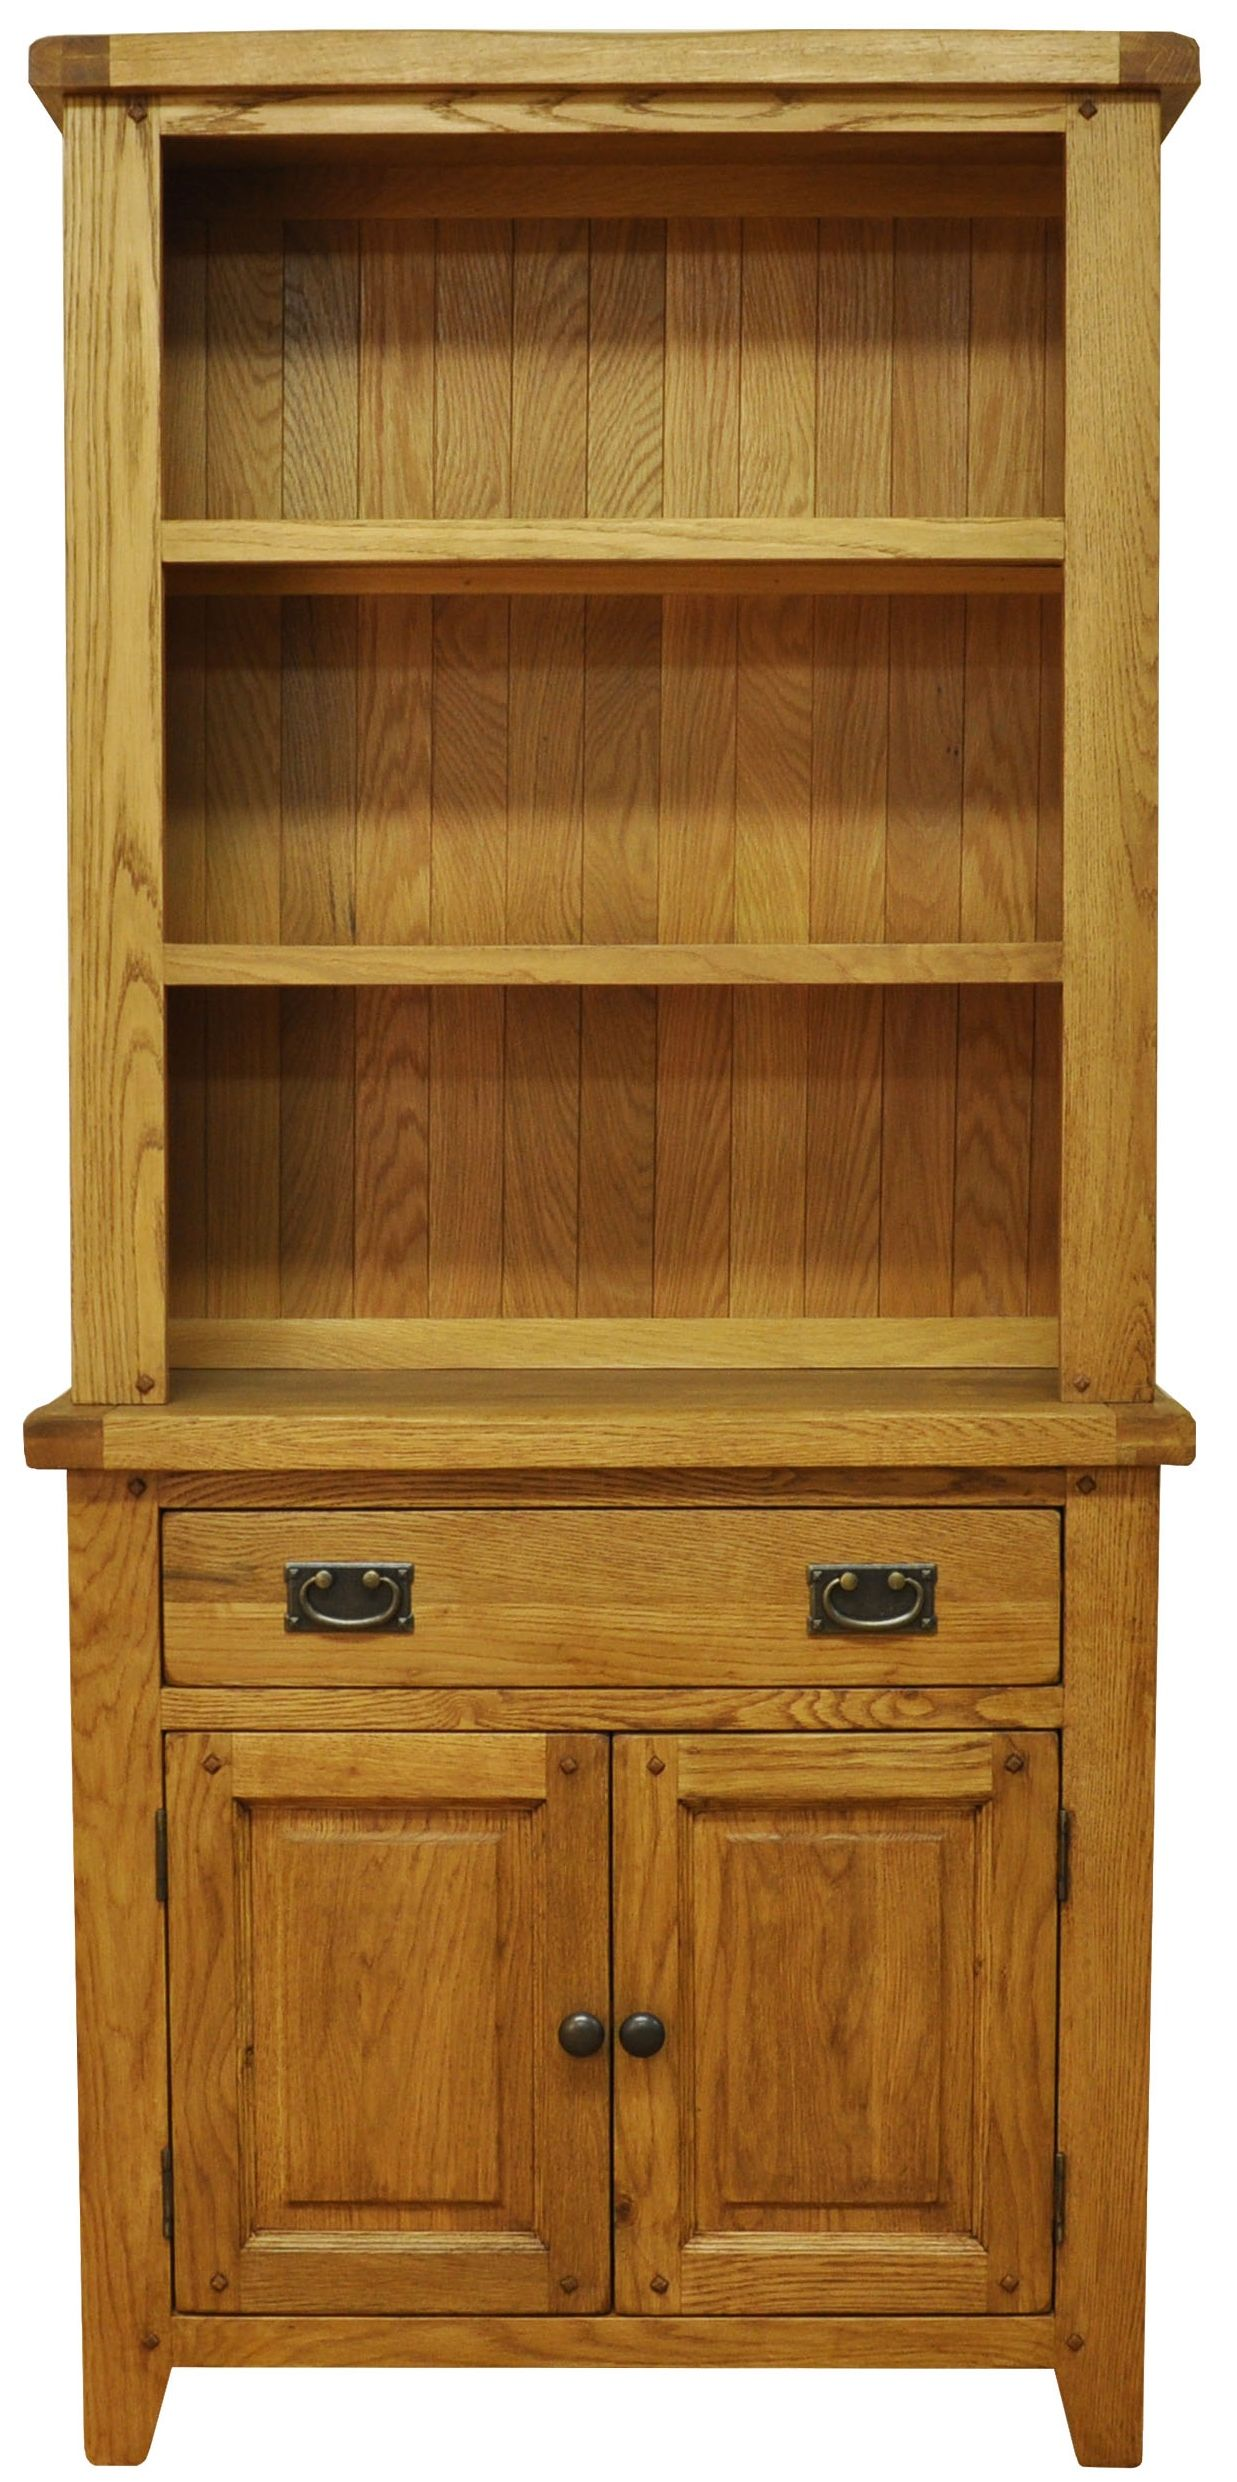 Stanton Small Rustic Oak Dresser With Open Top Small Dresser Oak Dresser Dresser Top